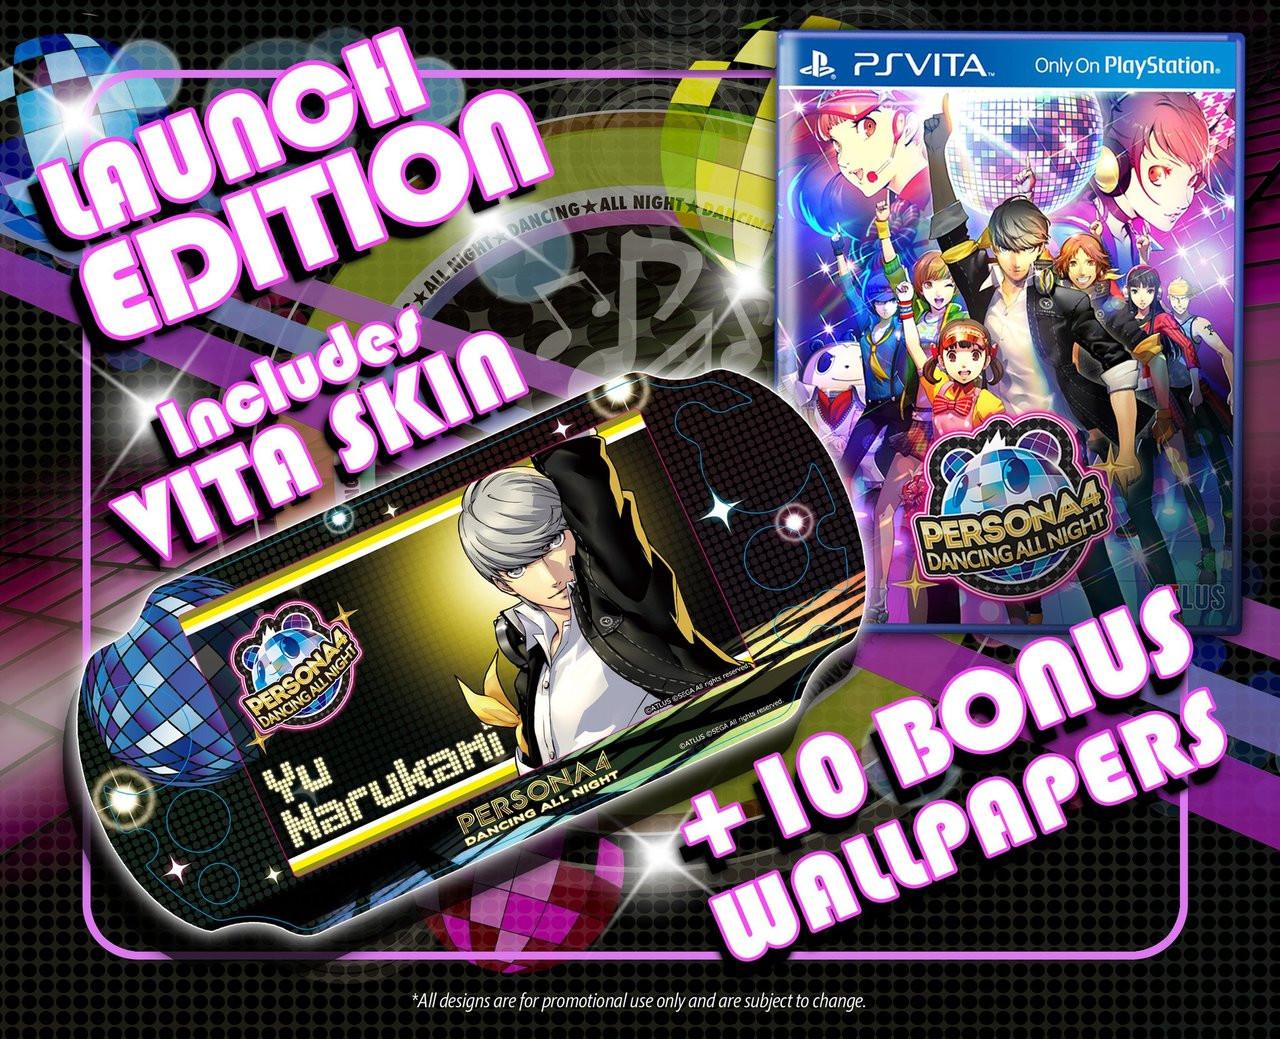 Persona 4: Dancing All Night - PlayStation Vita [Launch Edition]